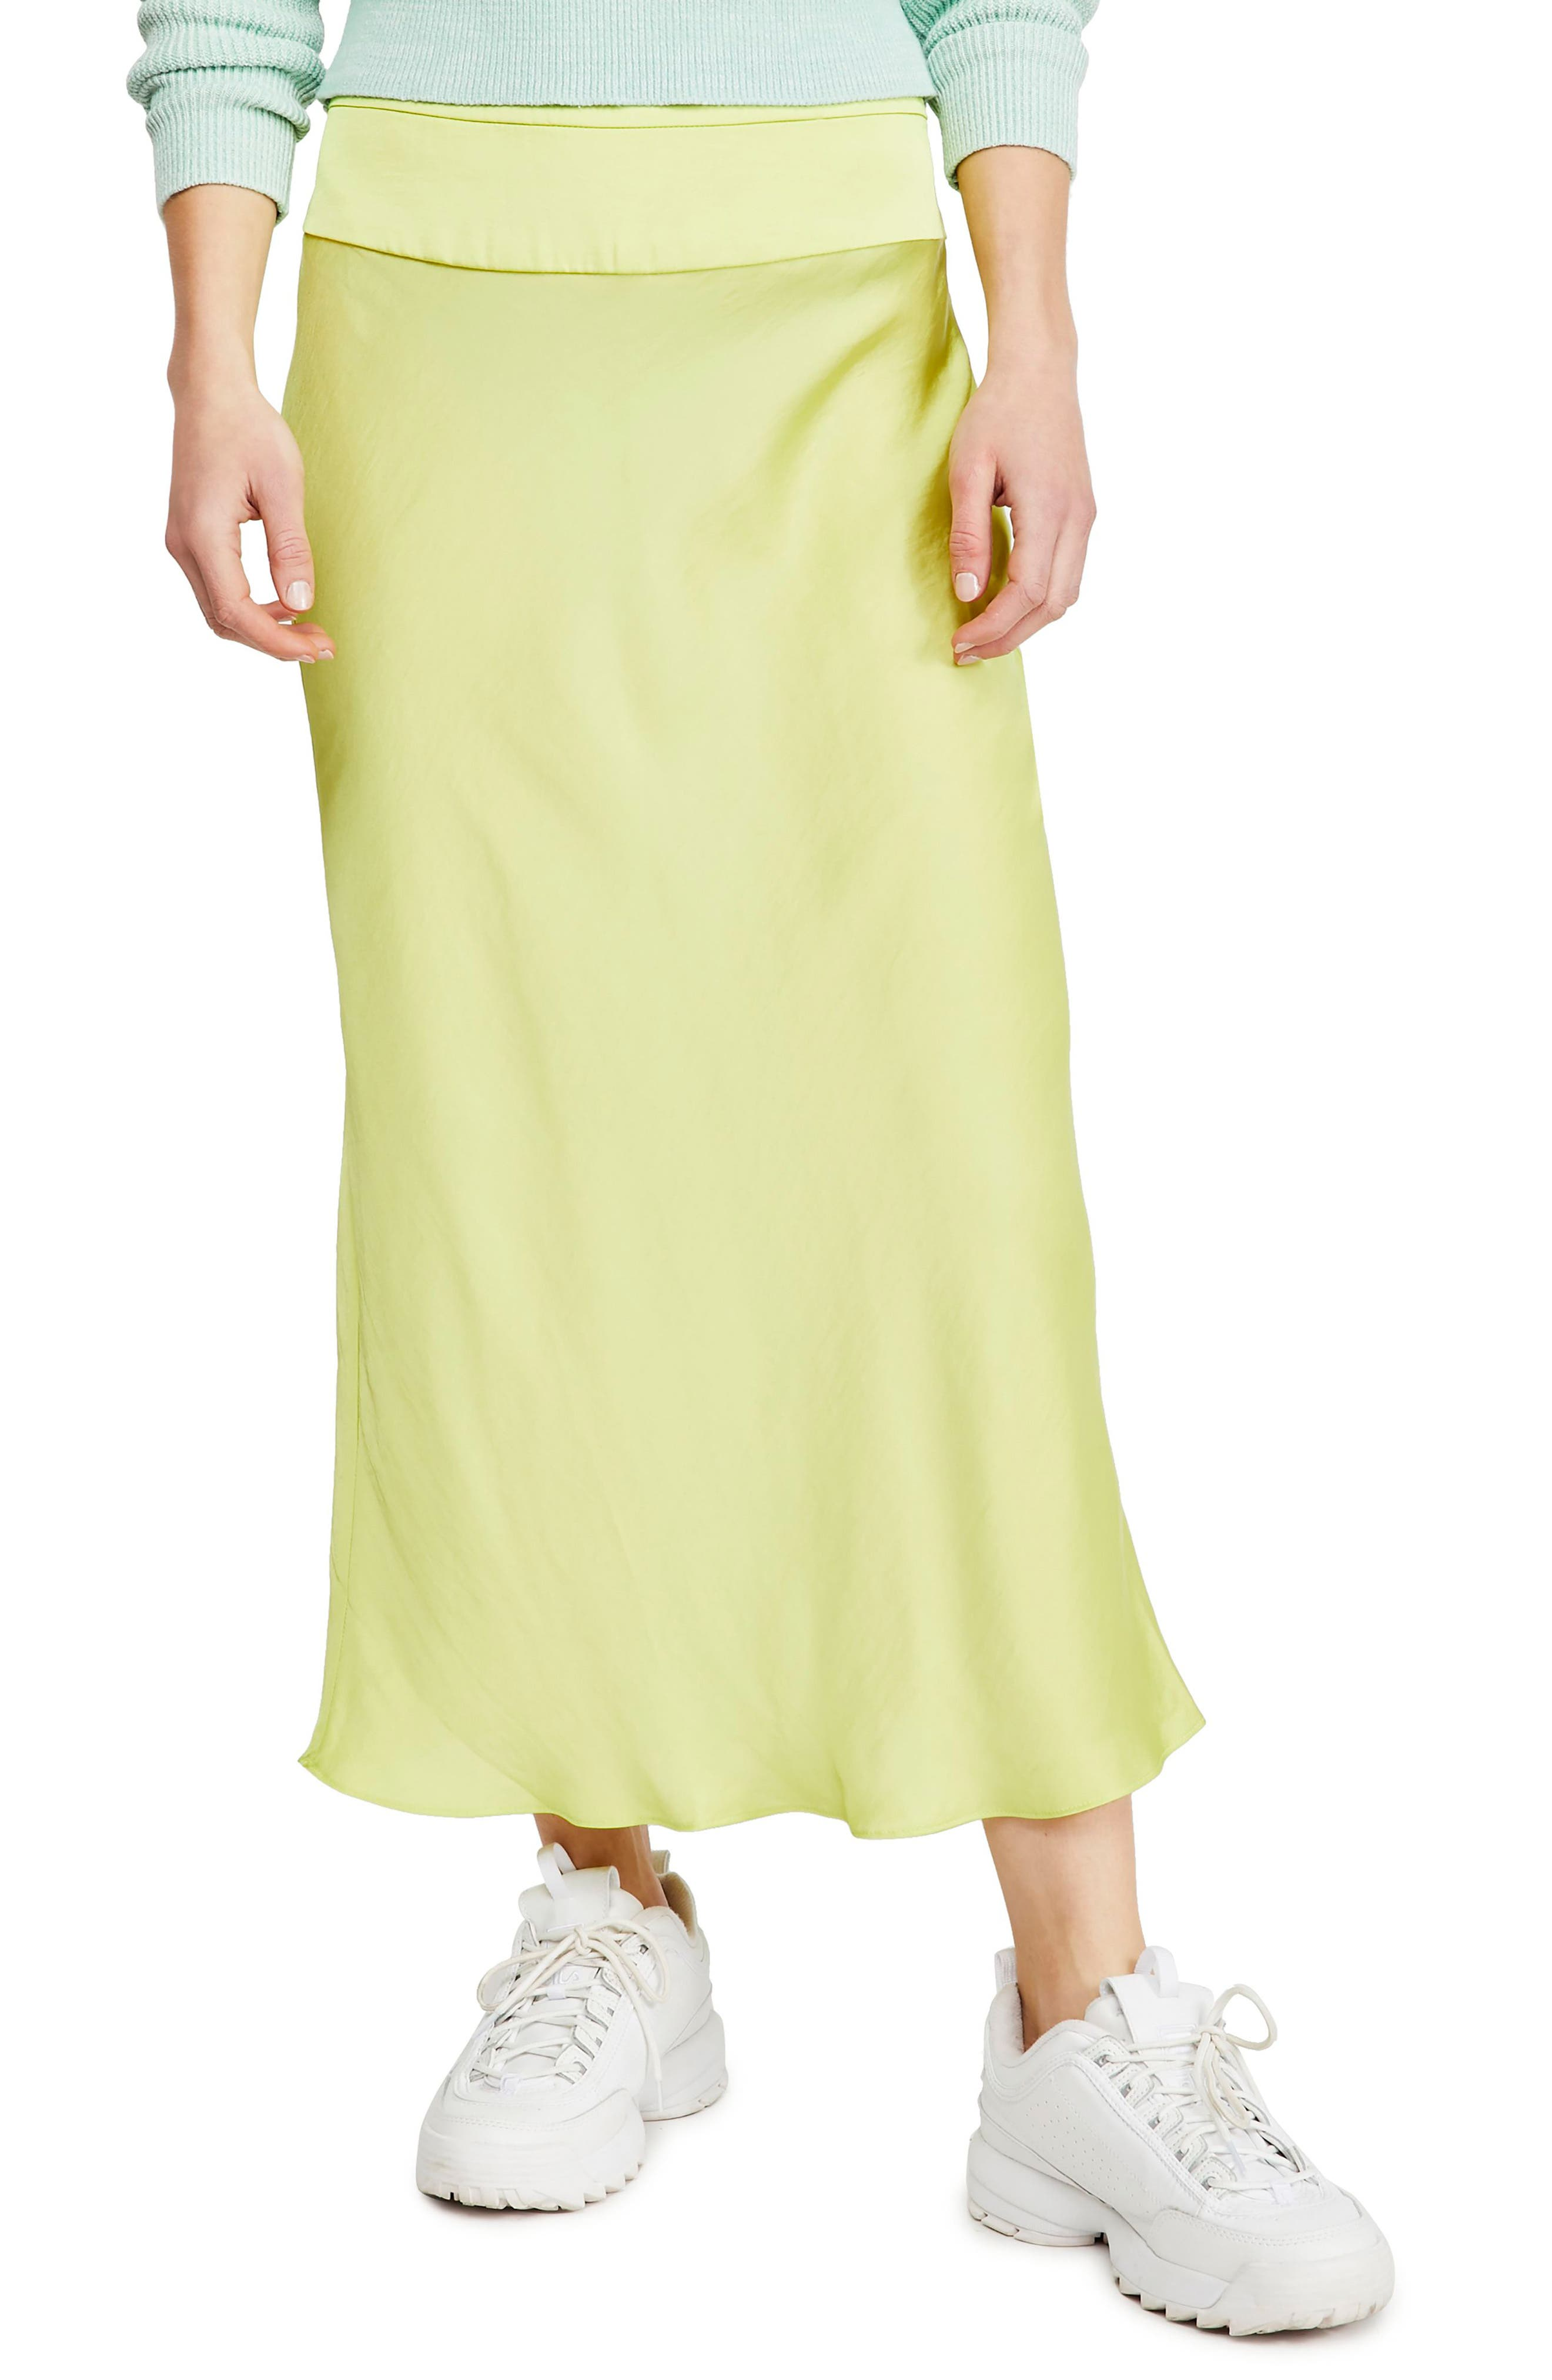 Free People Skirts NORMANI BIAS CUT SATIN SKIRT